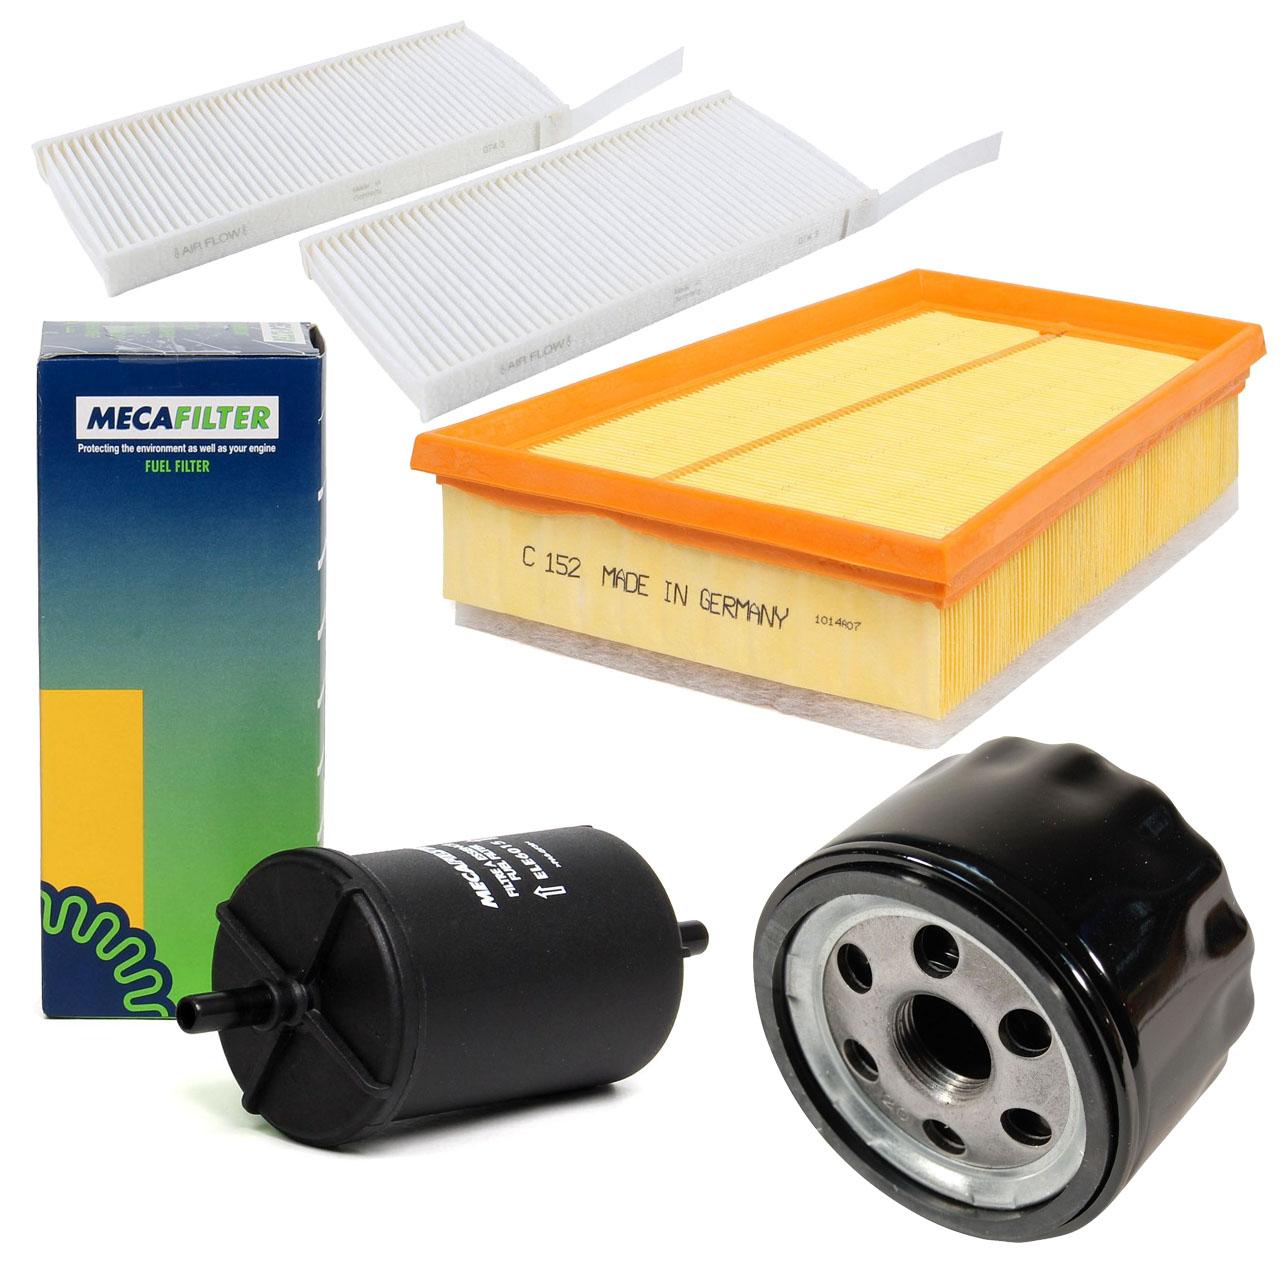 Inspektionskit Filterpaket Filterset für RENAULT KANGOO 1.6 87 PS ab 02.2008